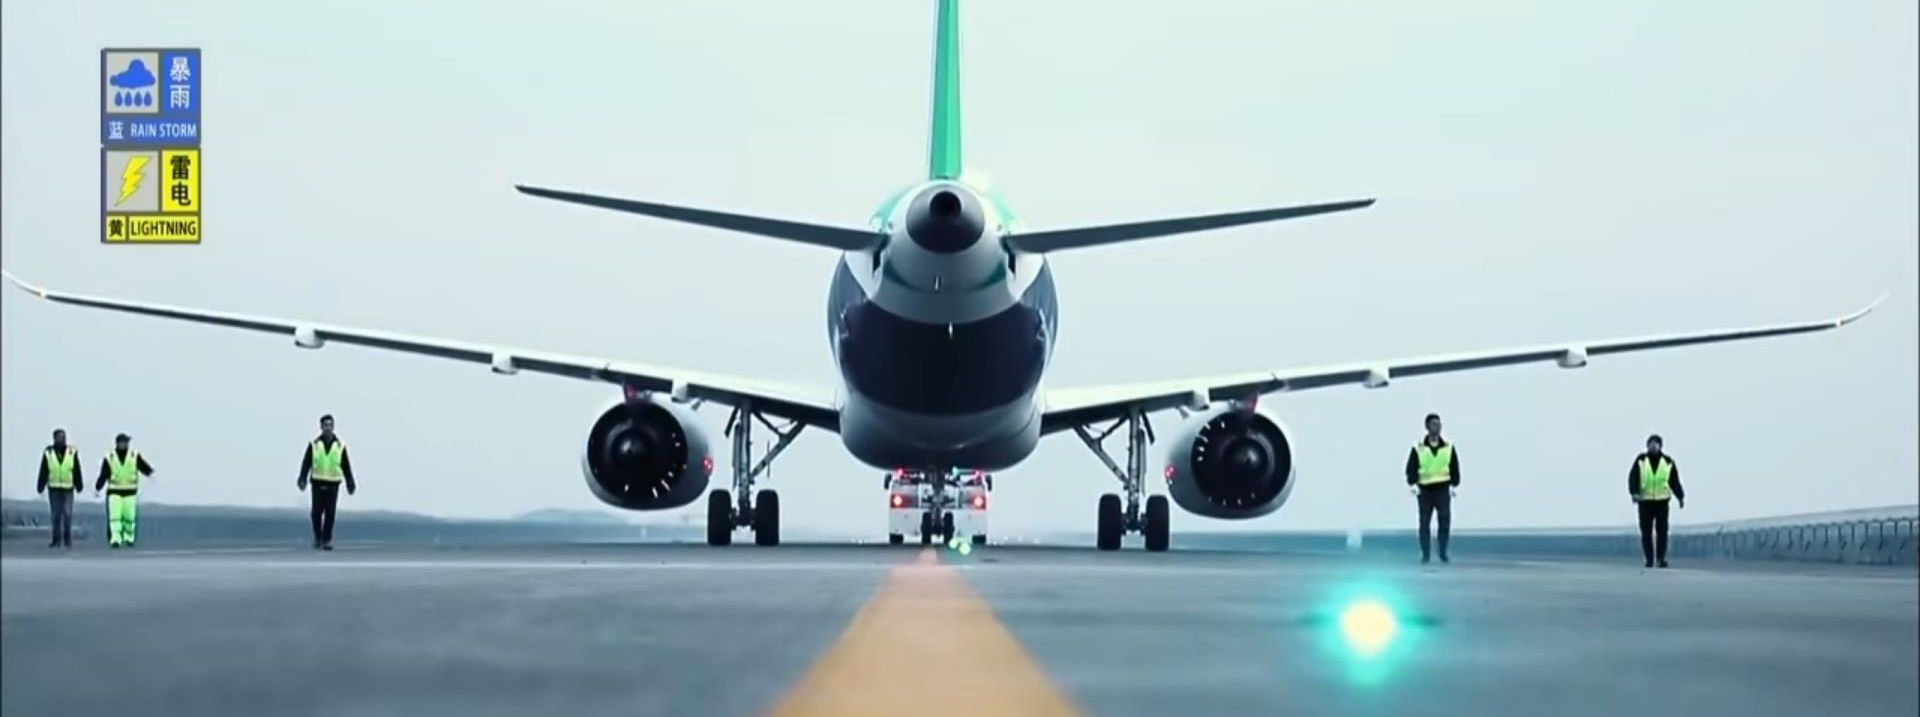 Uspješni probni let prototipa kineskog mlažnjaka C919